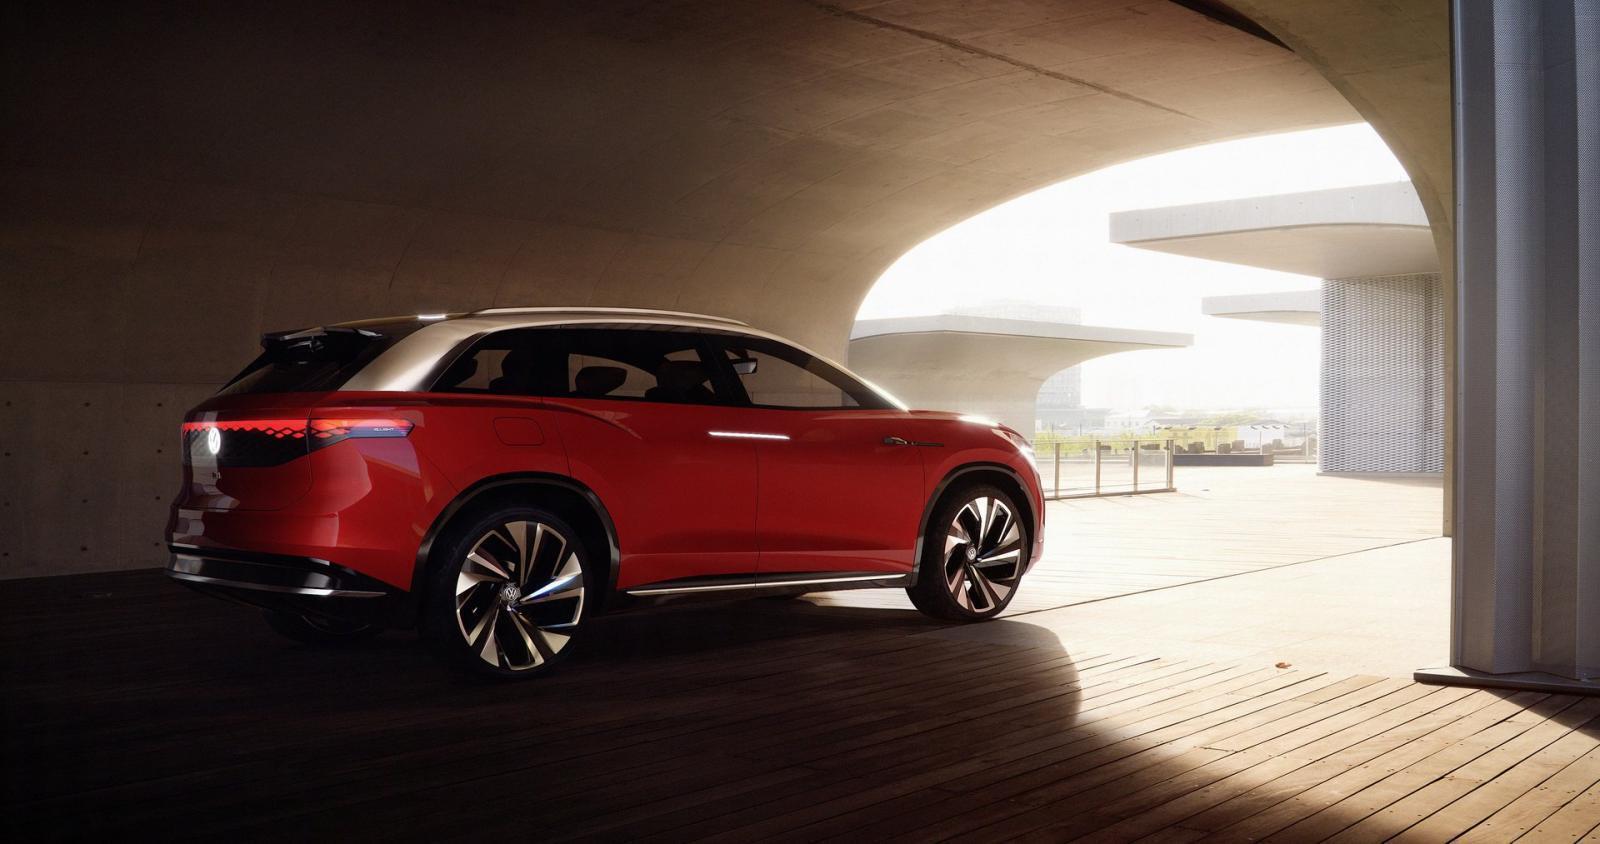 volkswagen-id-roomzz-concept-suv-dien-co-cu-li-di-chuyen-450-km-va-lap-dat-3-hang-ghe-duoc-ra-mat-3.jpg